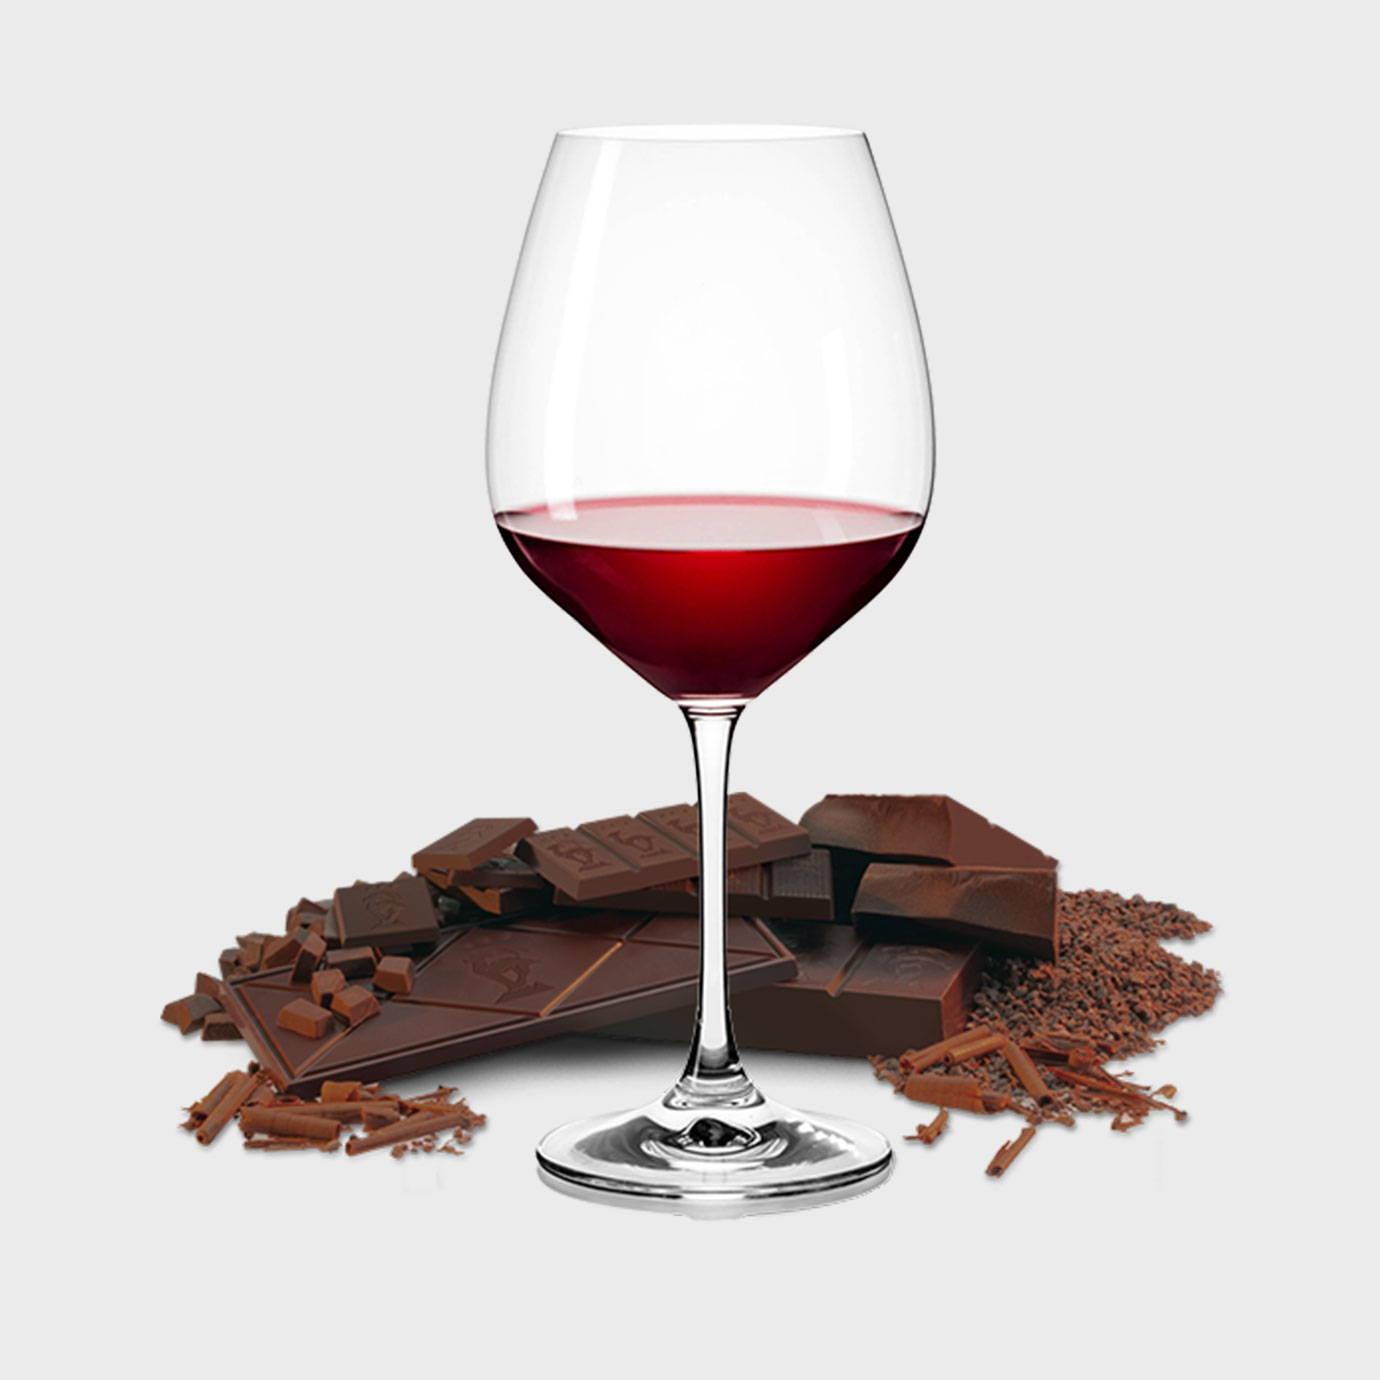 Wine and Chocolate image